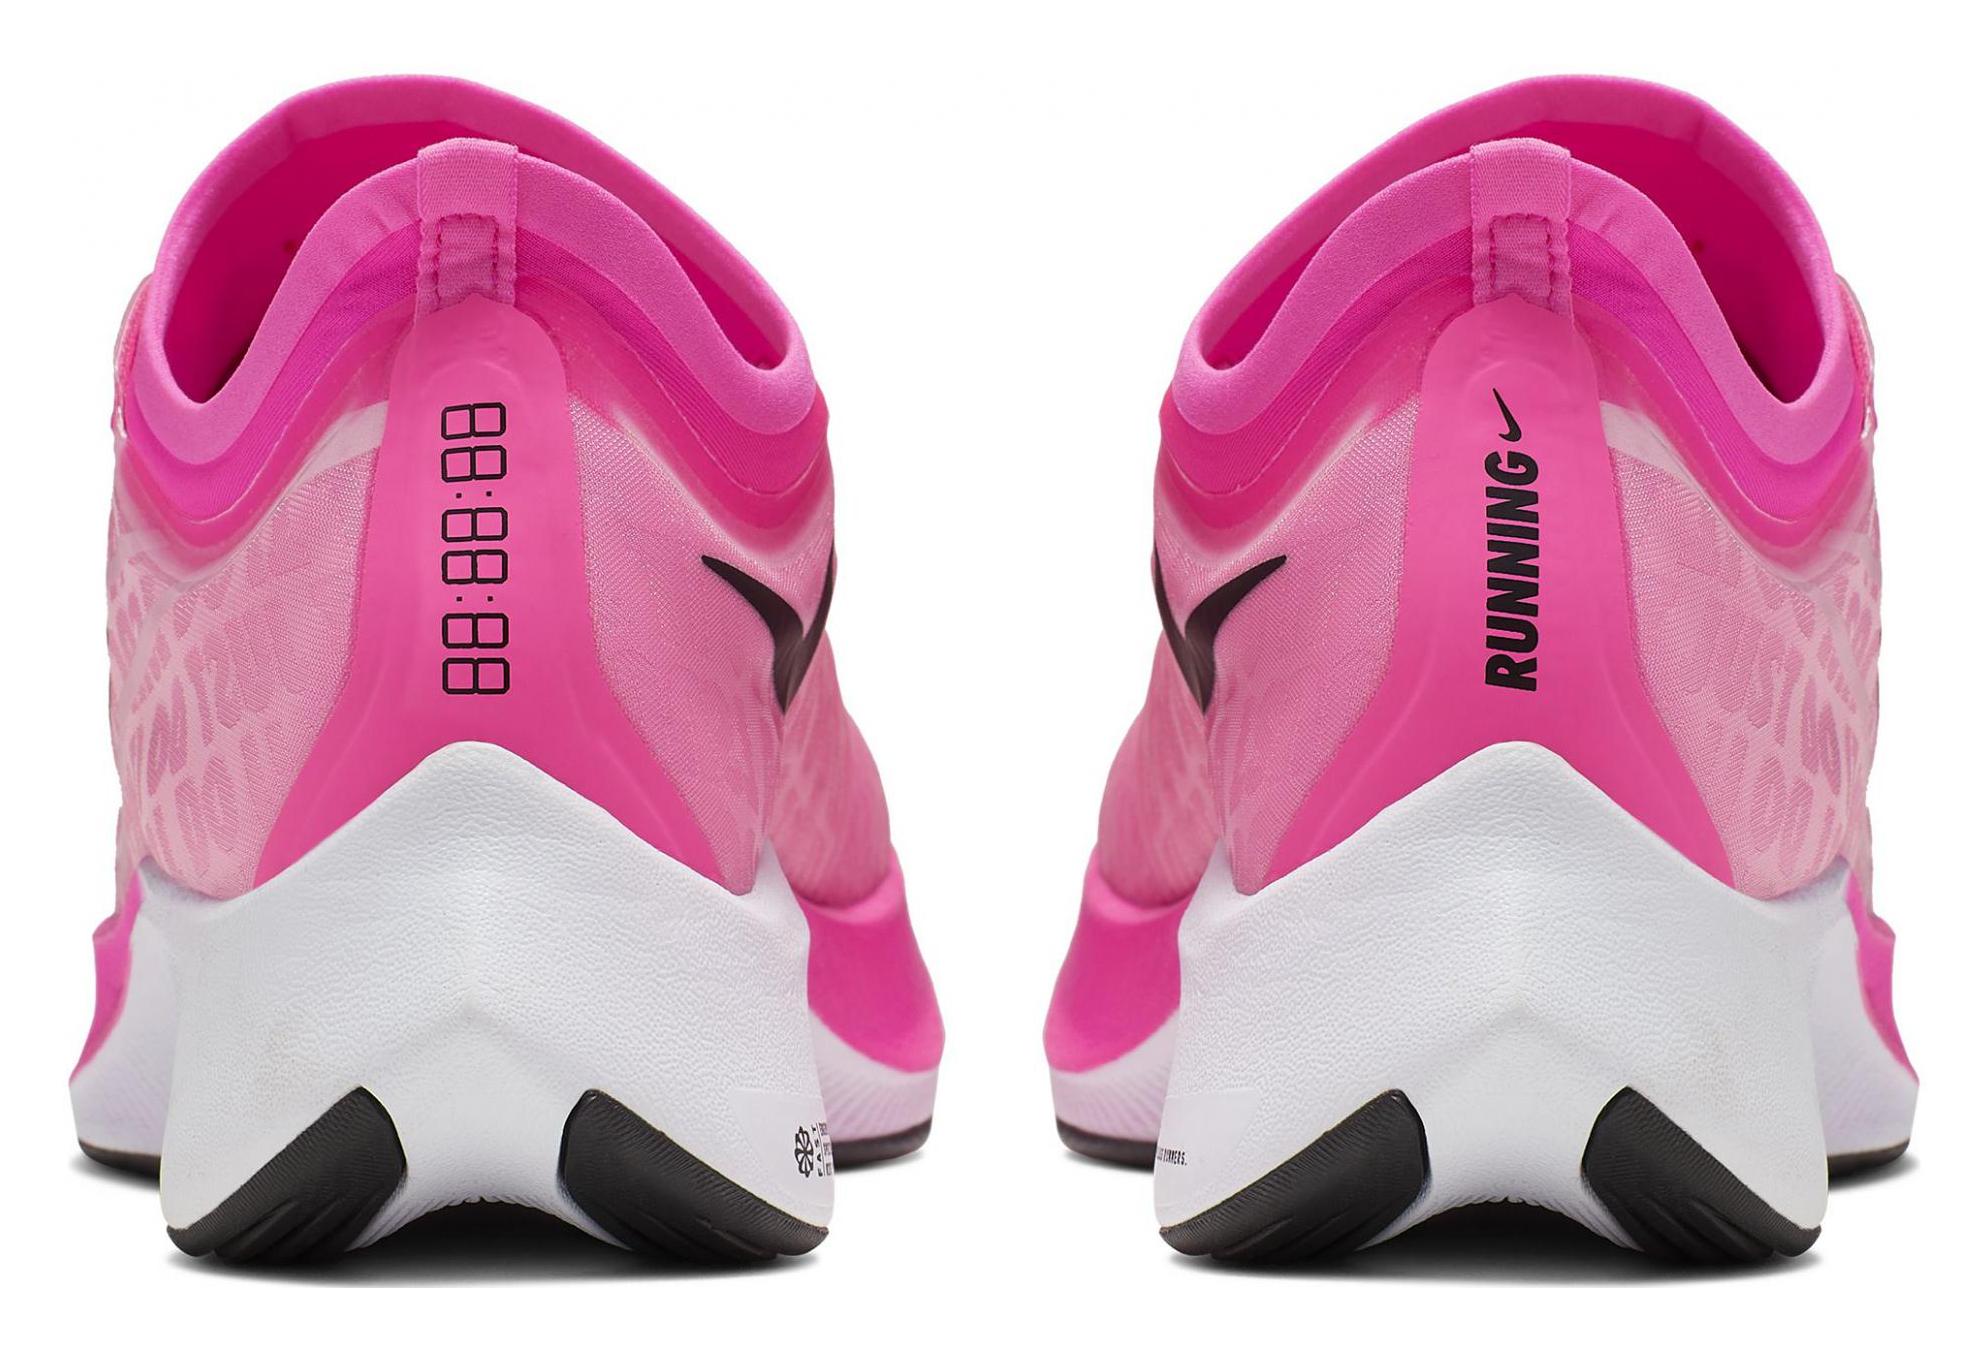 watch reasonably priced amazing selection Nike Zoom Fly 3 Pink Black Women | Alltricks.com